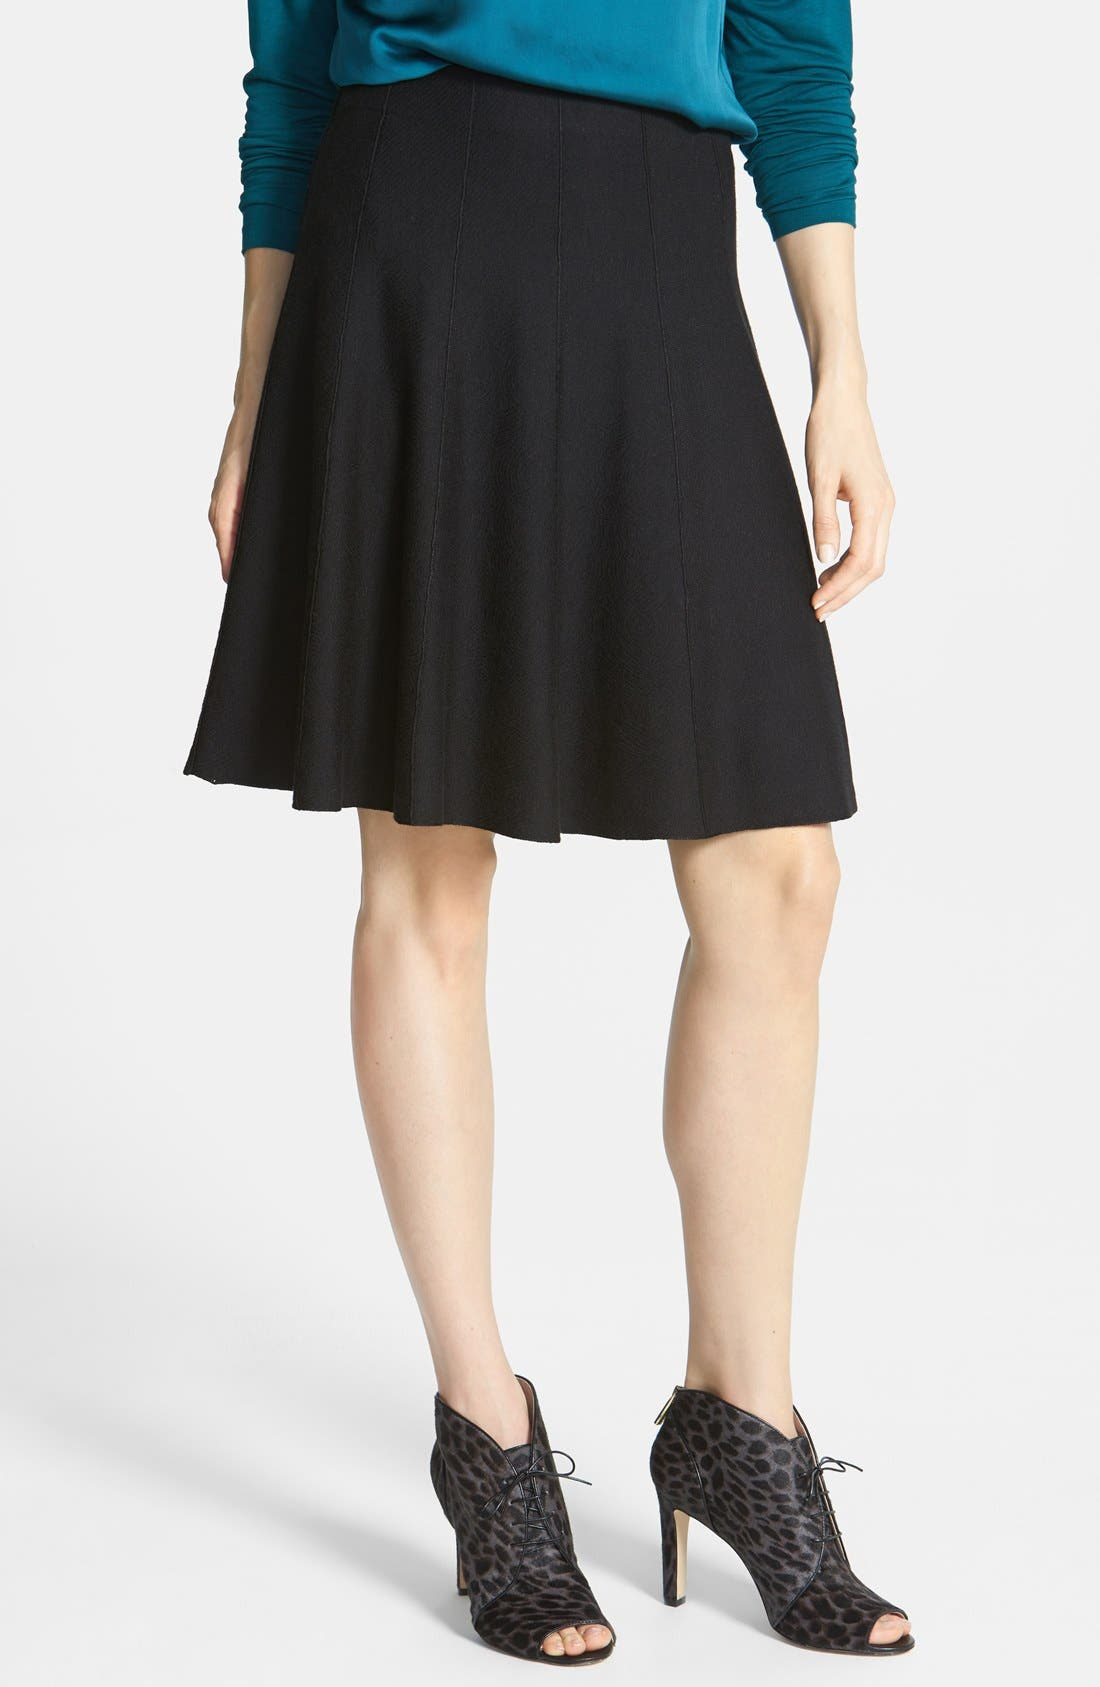 Main Image - NIC+ZOE 'Paneled Twirl' Flirt Skirt